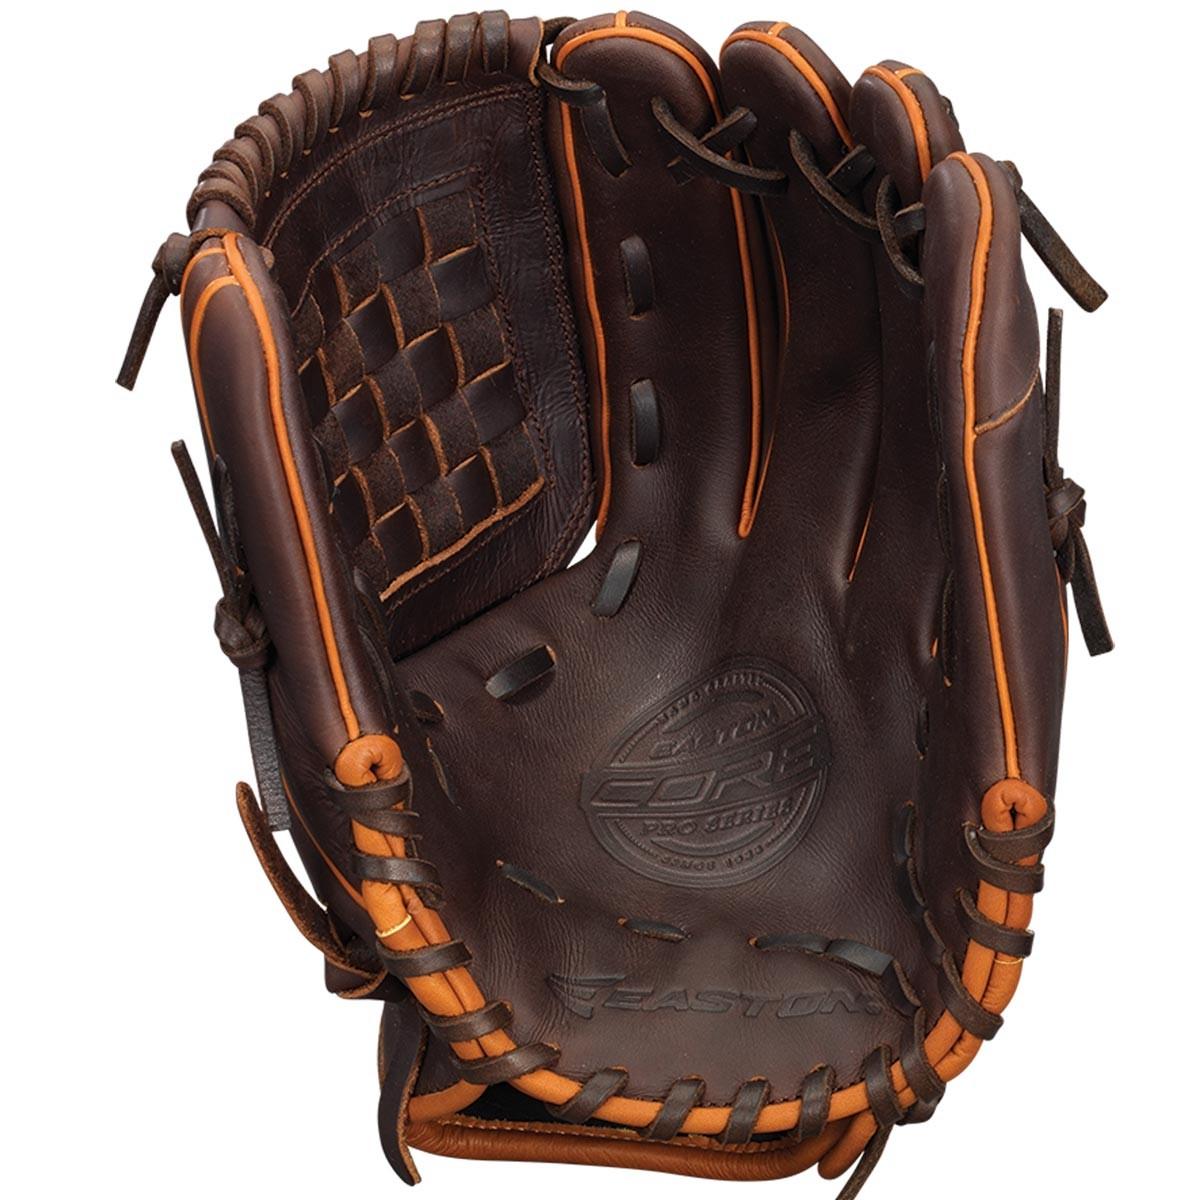 Easton Ecg 1201 Dbt Core Pro Baseball Glove 12 Quot